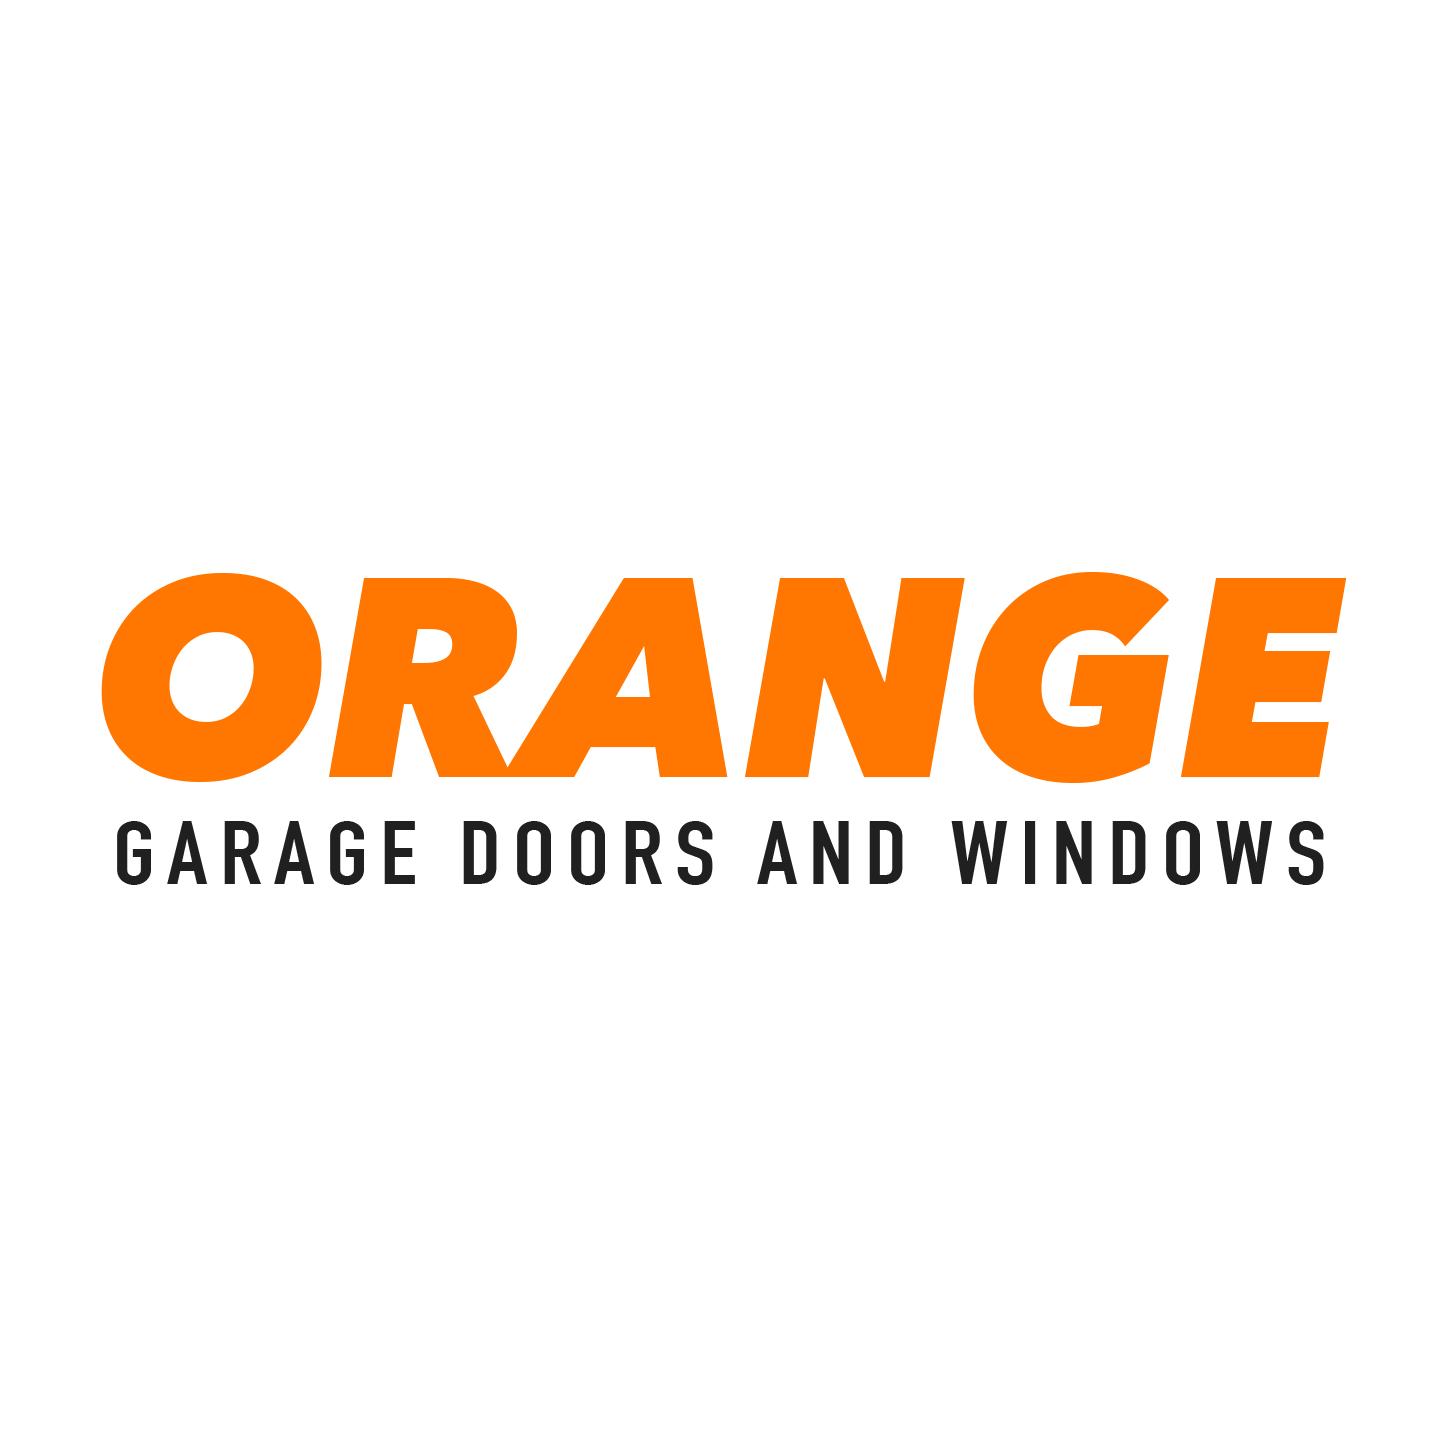 Orange Garage Doors And Windows image 0